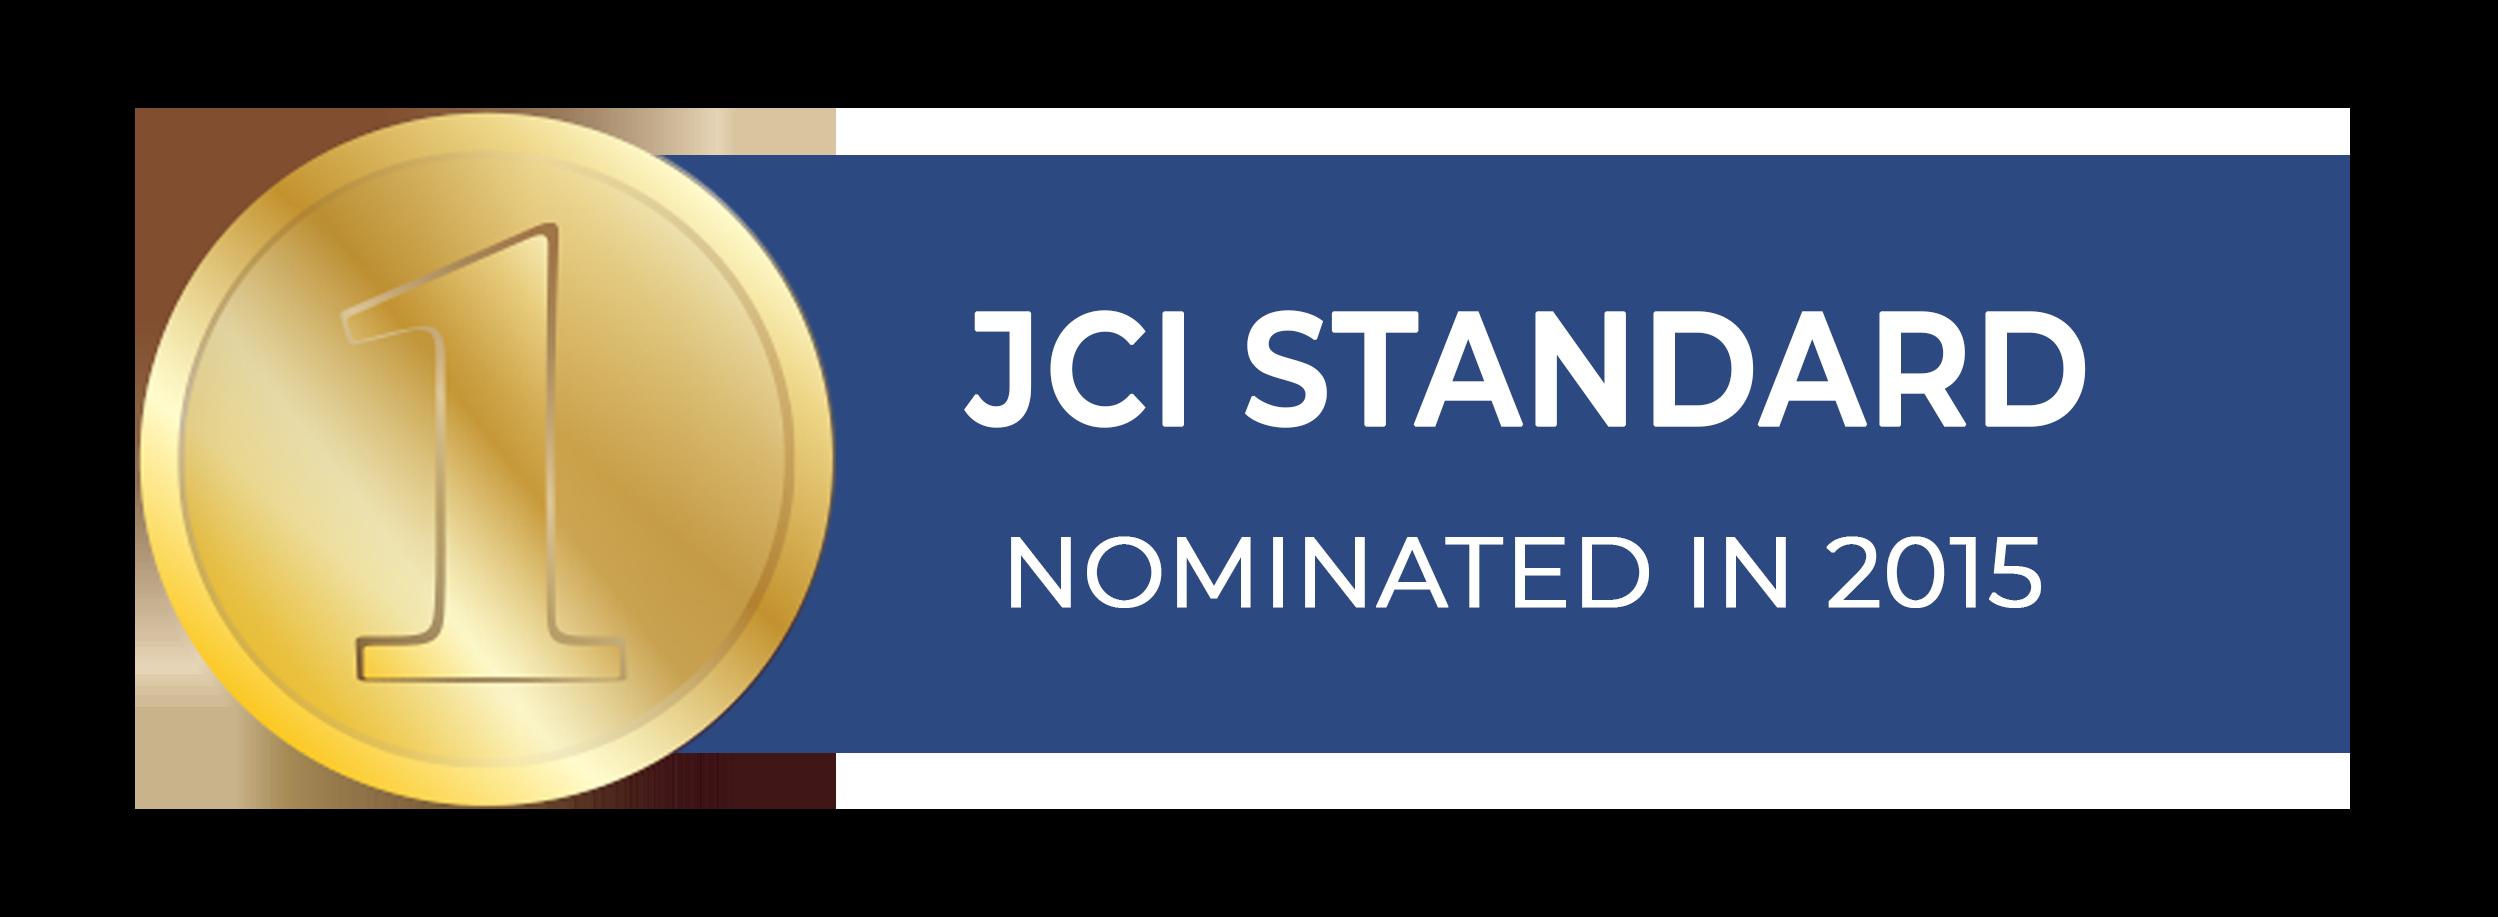 JCI standard logo